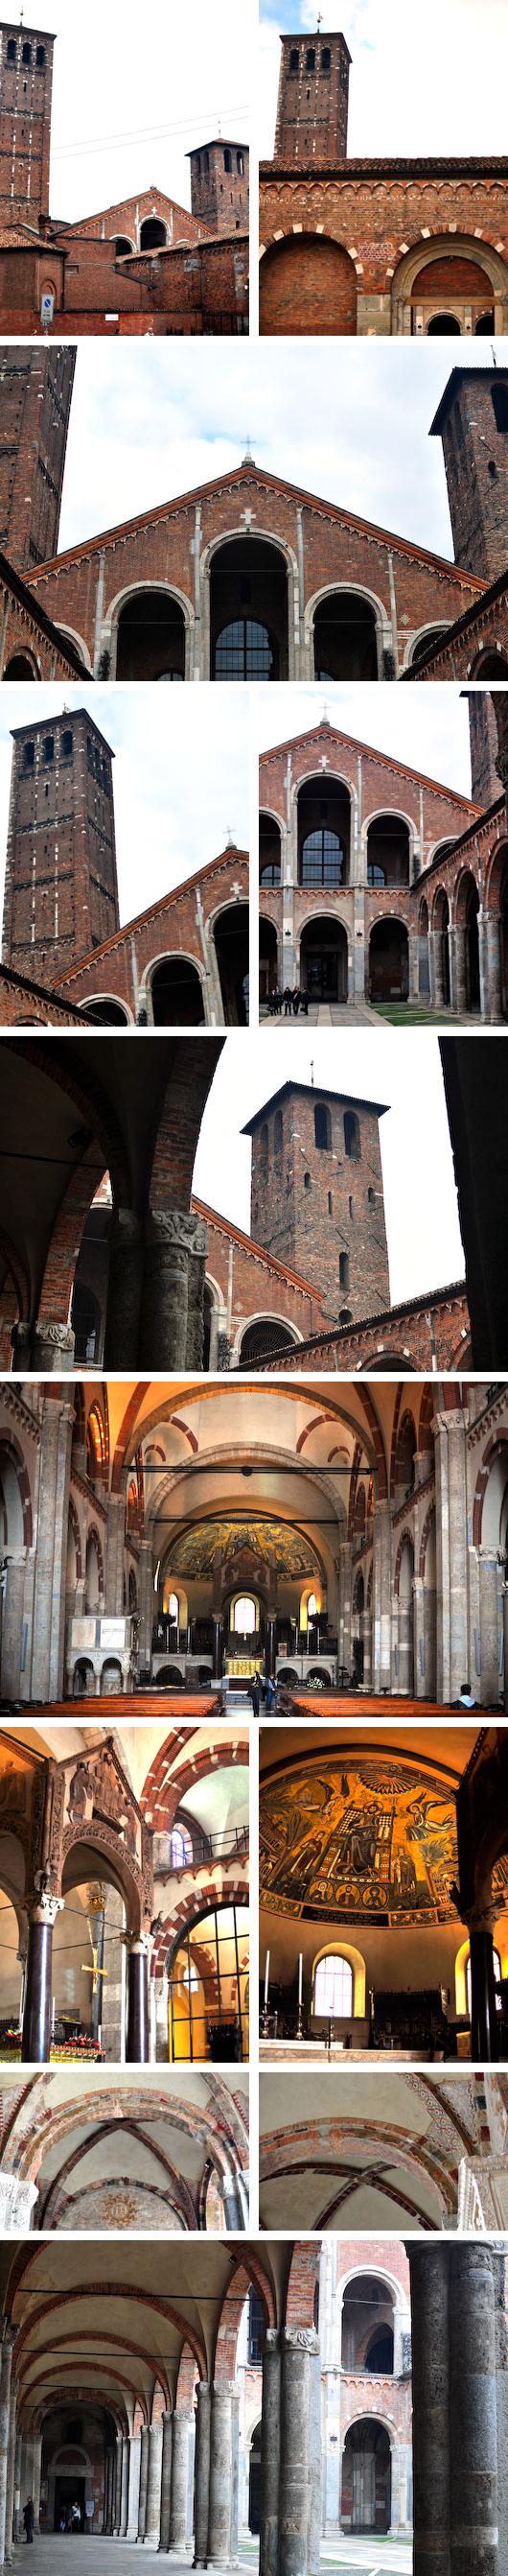 Milan 11.5.2010_Basilica of Sant' Ambrogio